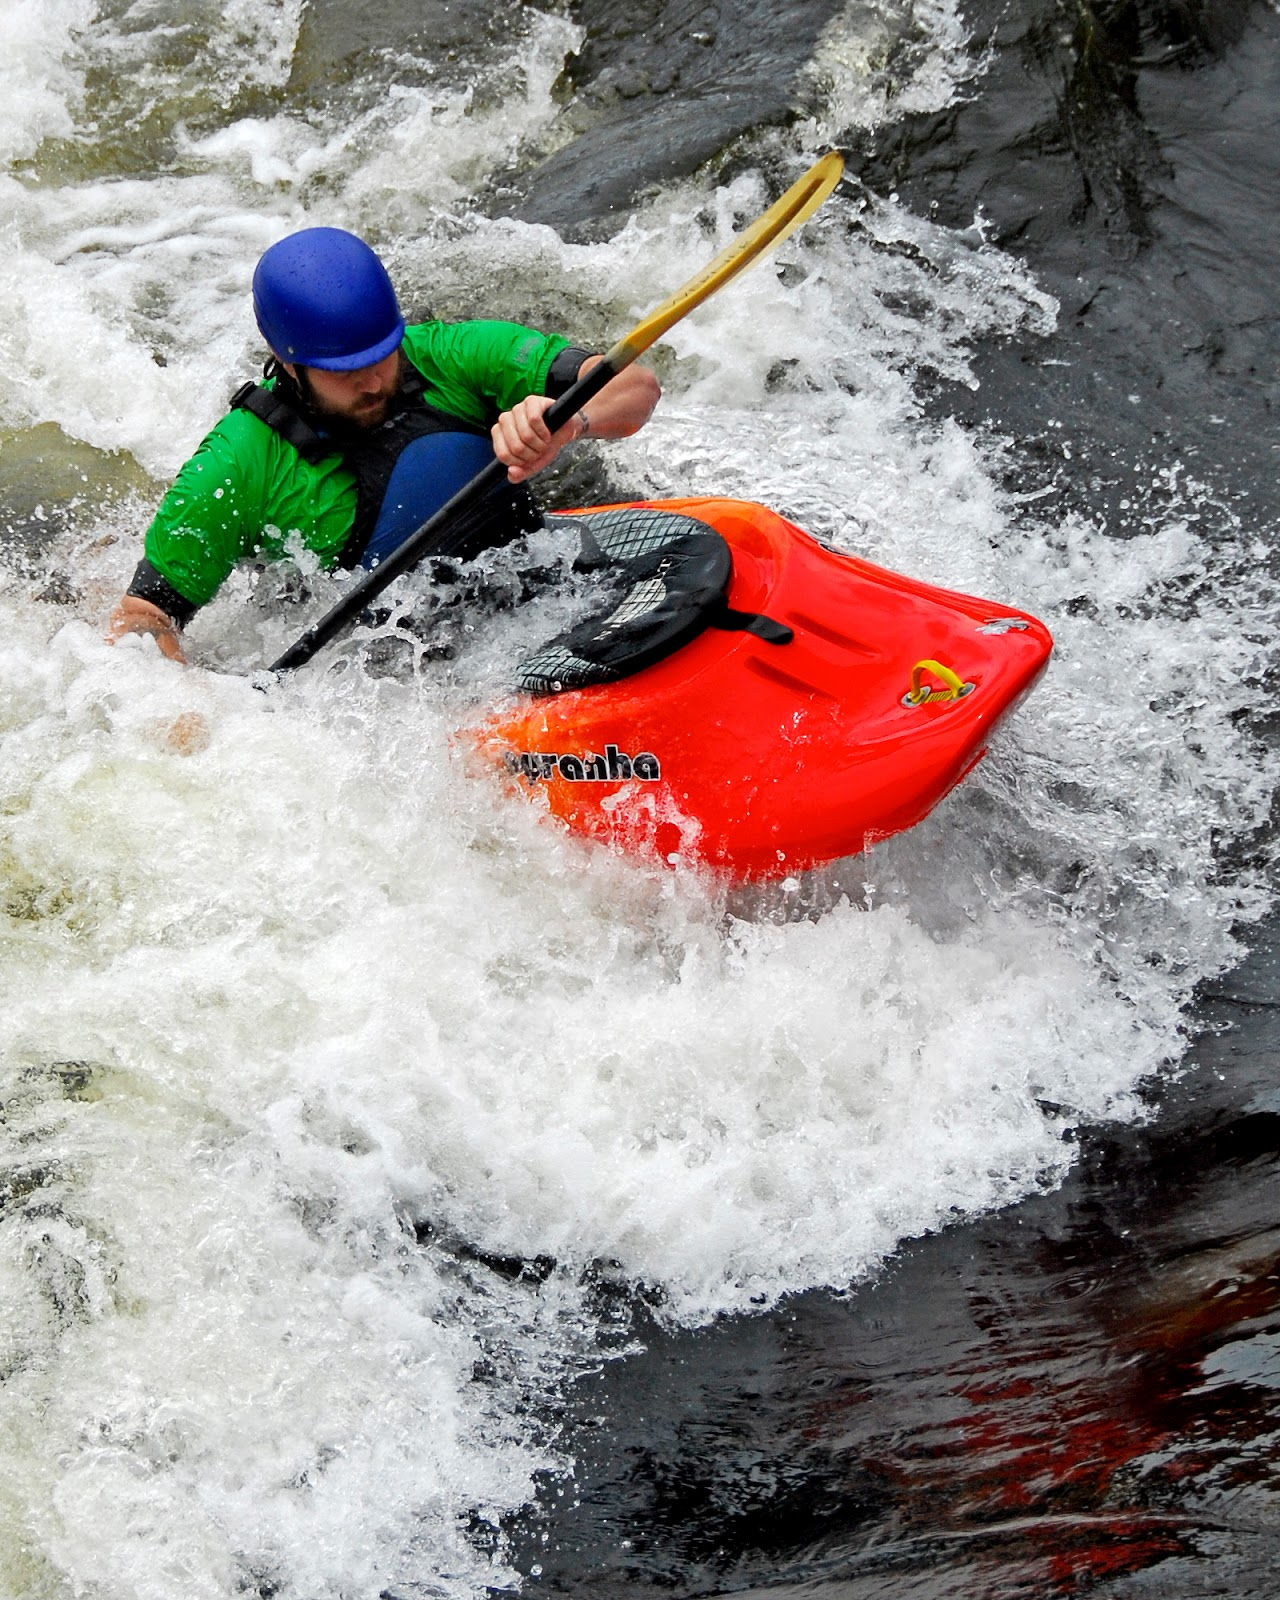 https://upload.wikimedia.org/wikipedia/commons/9/96/Kayak_Playboat_ManchesterNH.jpg